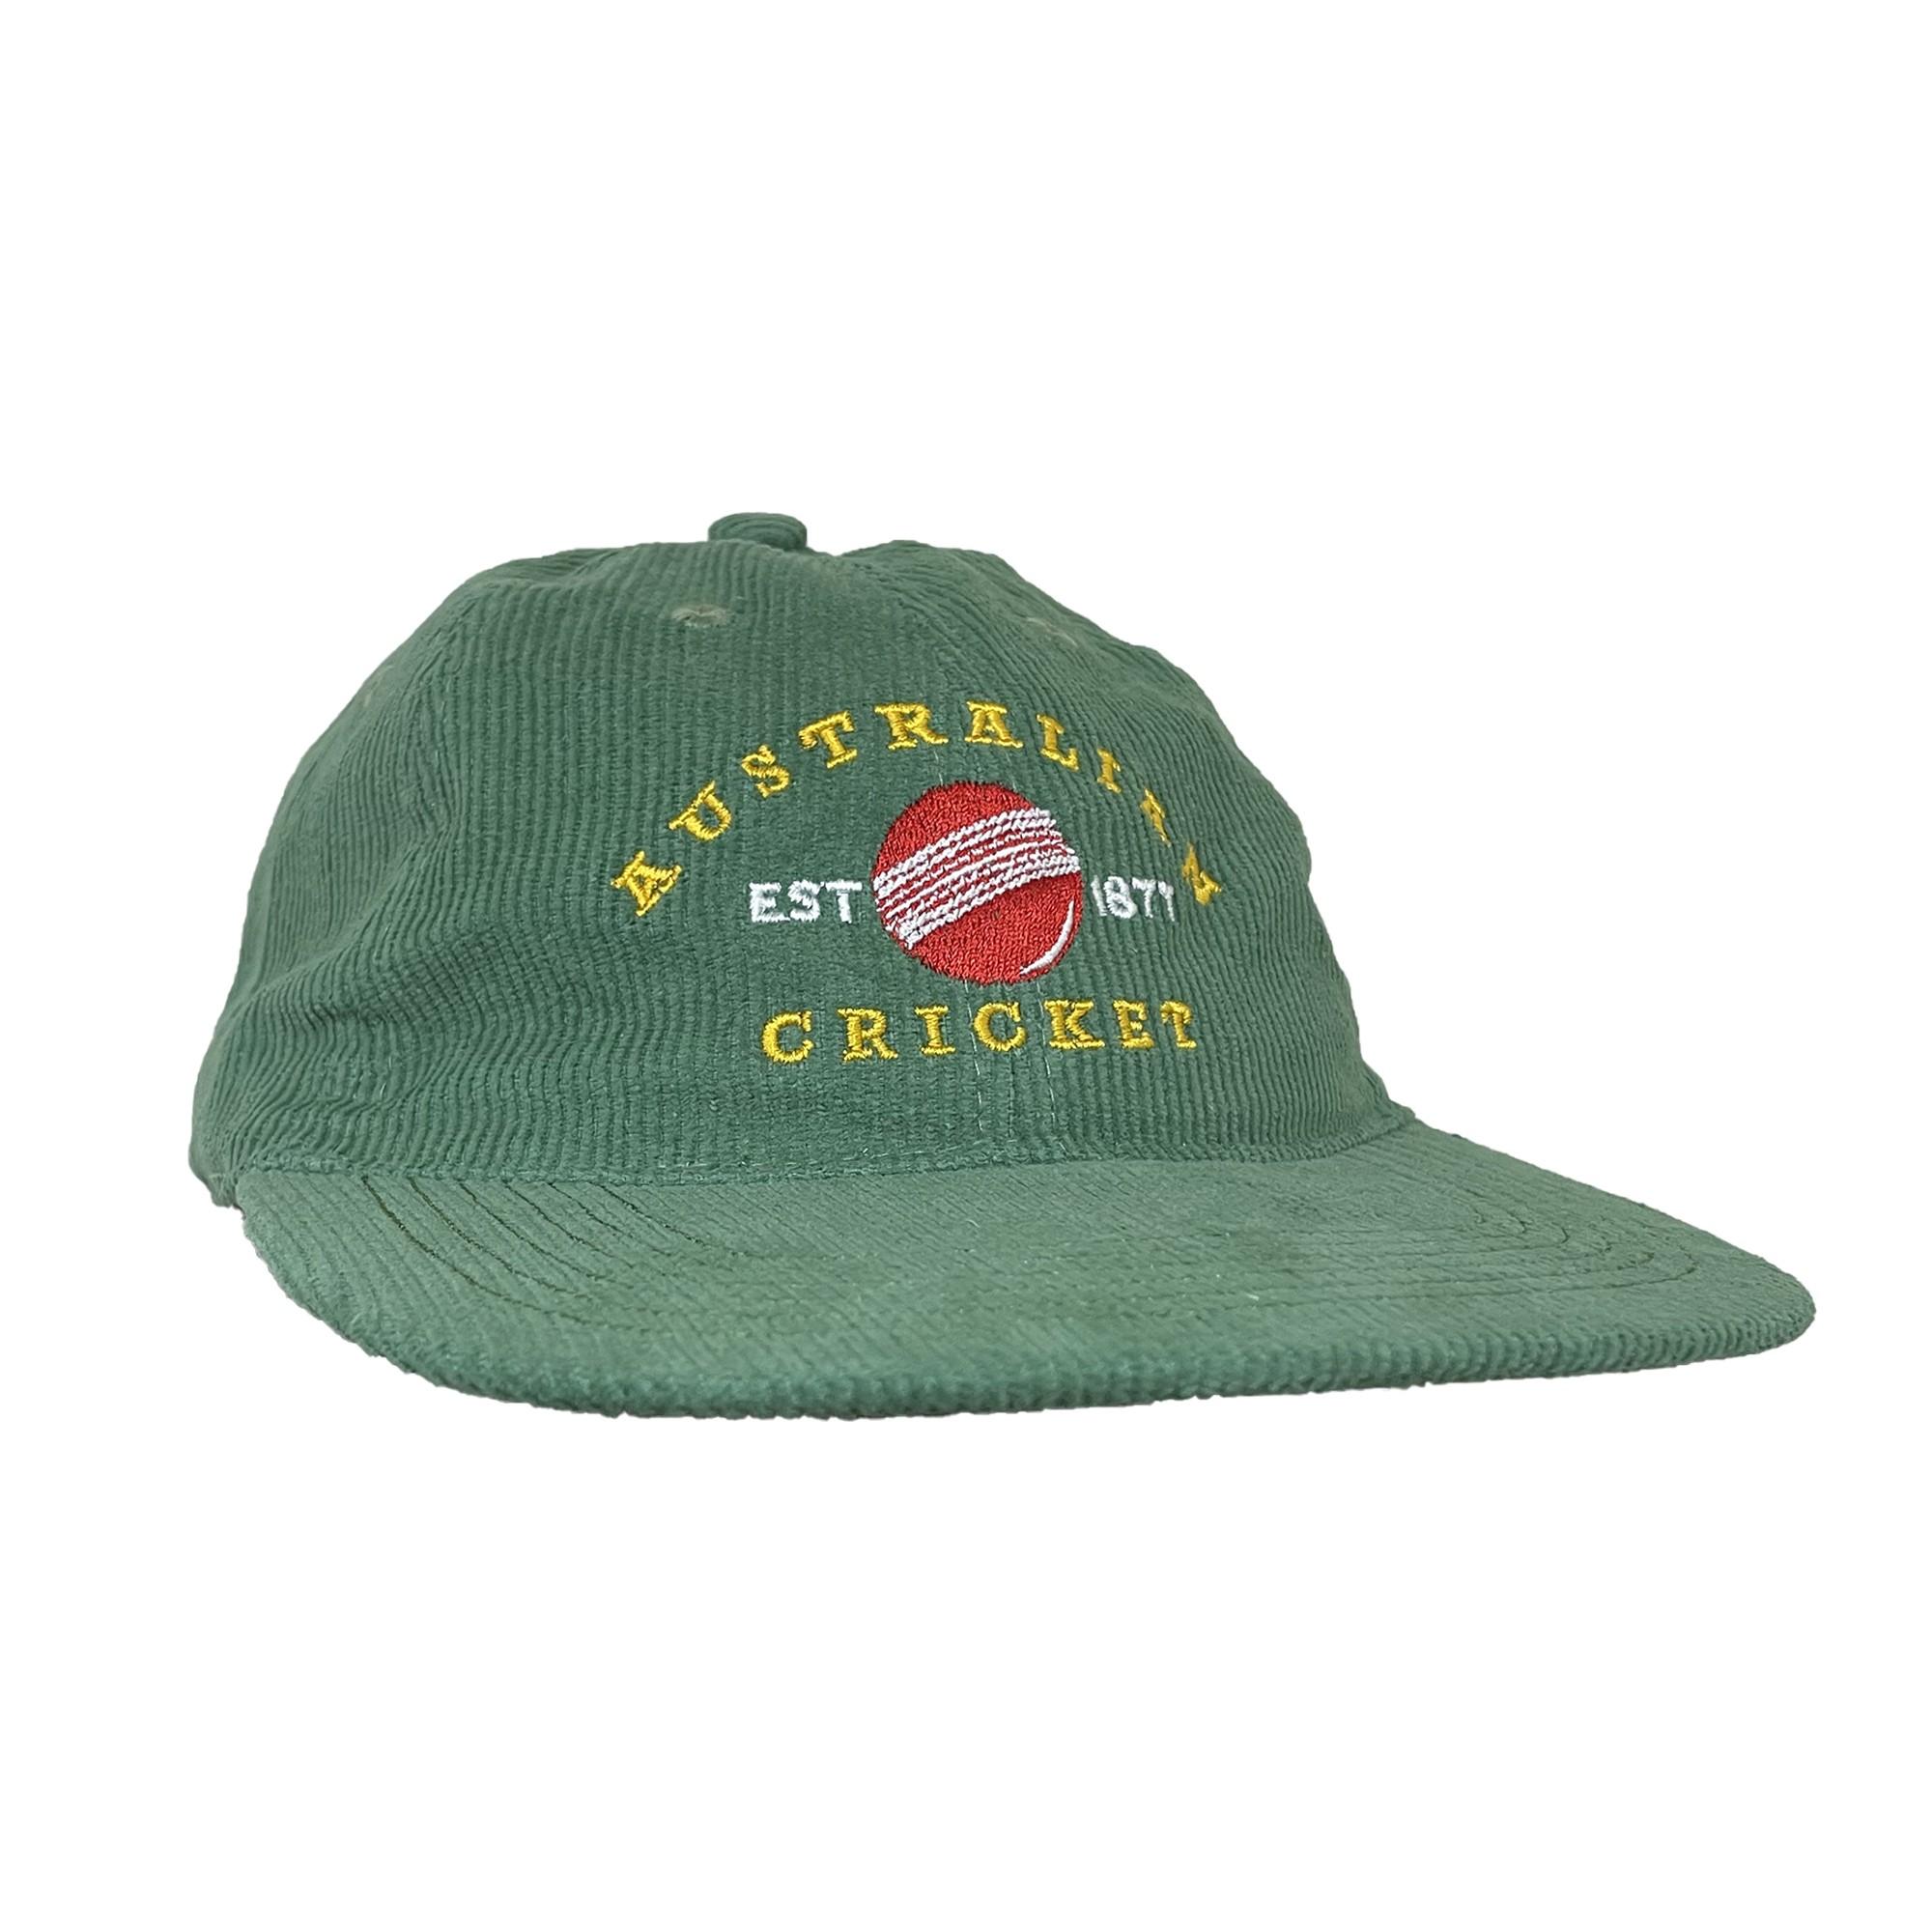 AUSTRALIAN CRICKET GREEN CORD HAT